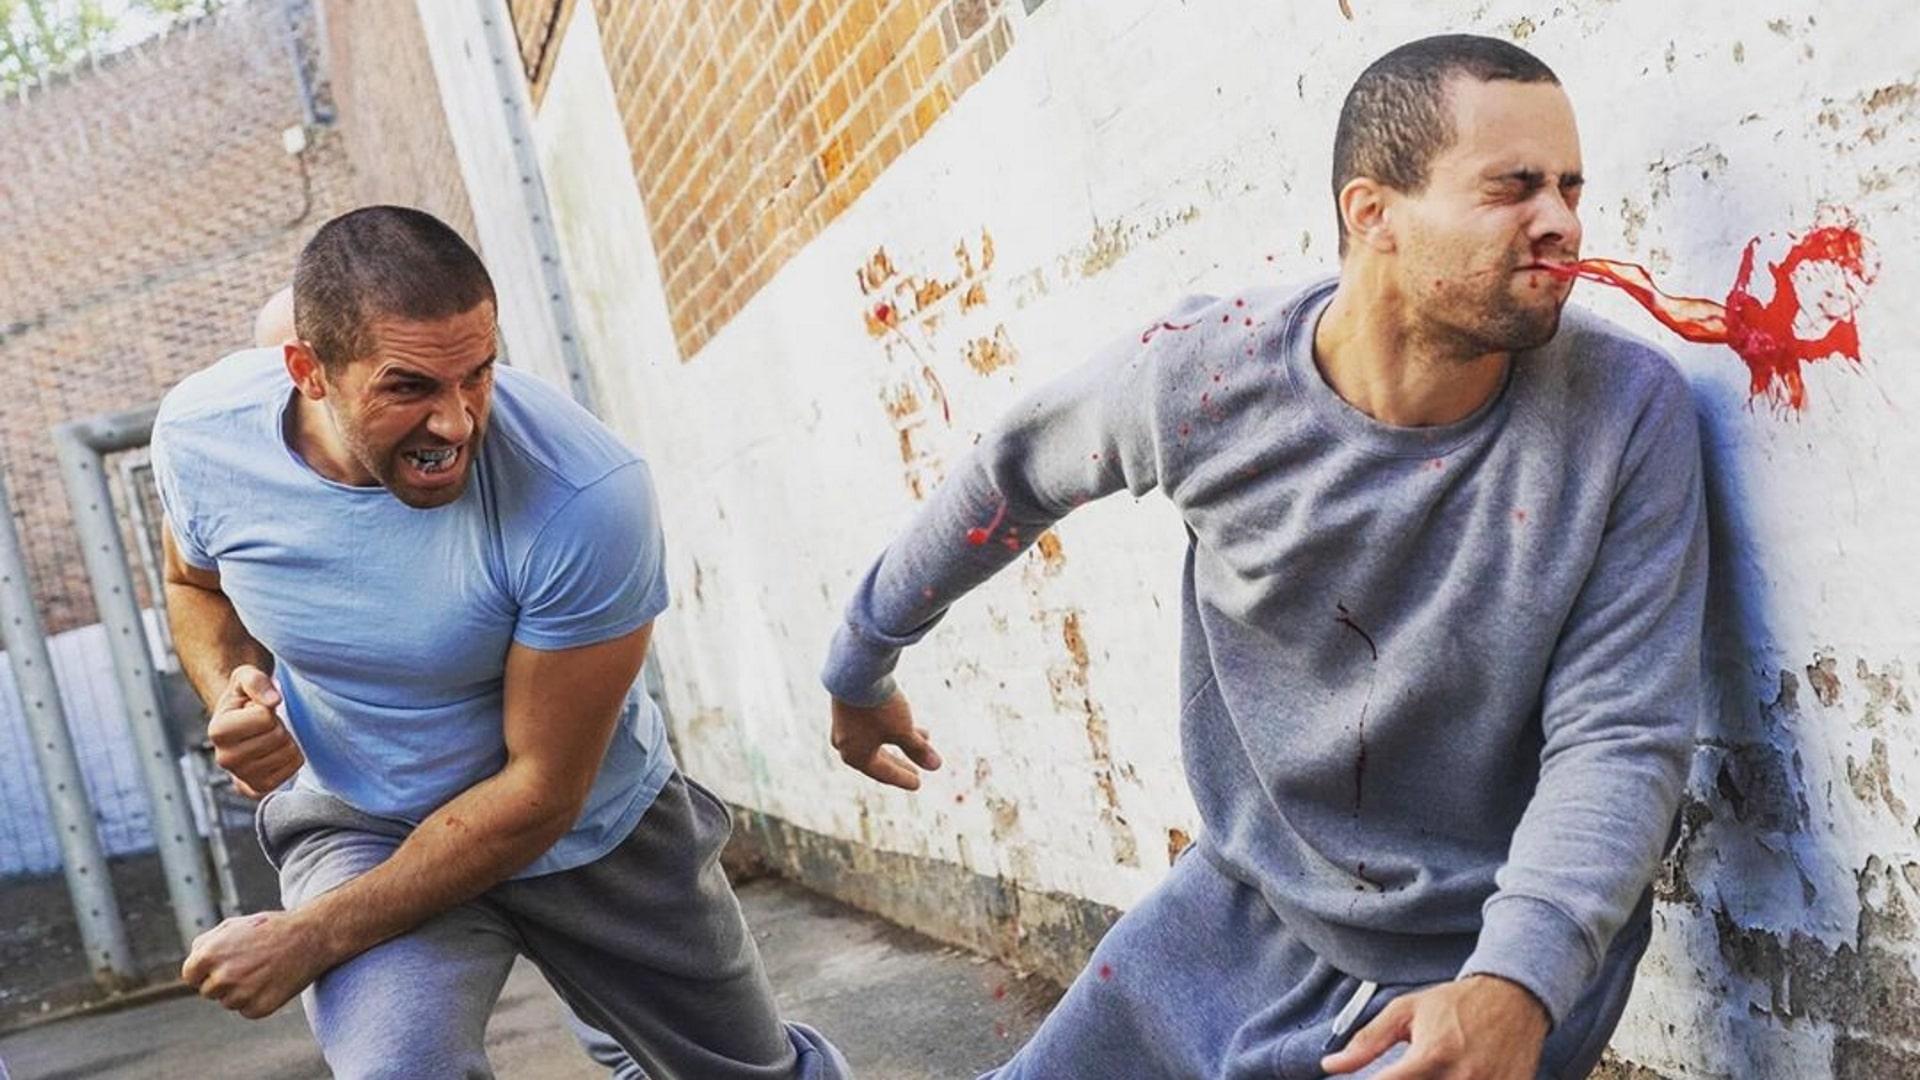 Prison yard fight Avengement Scott Adkins